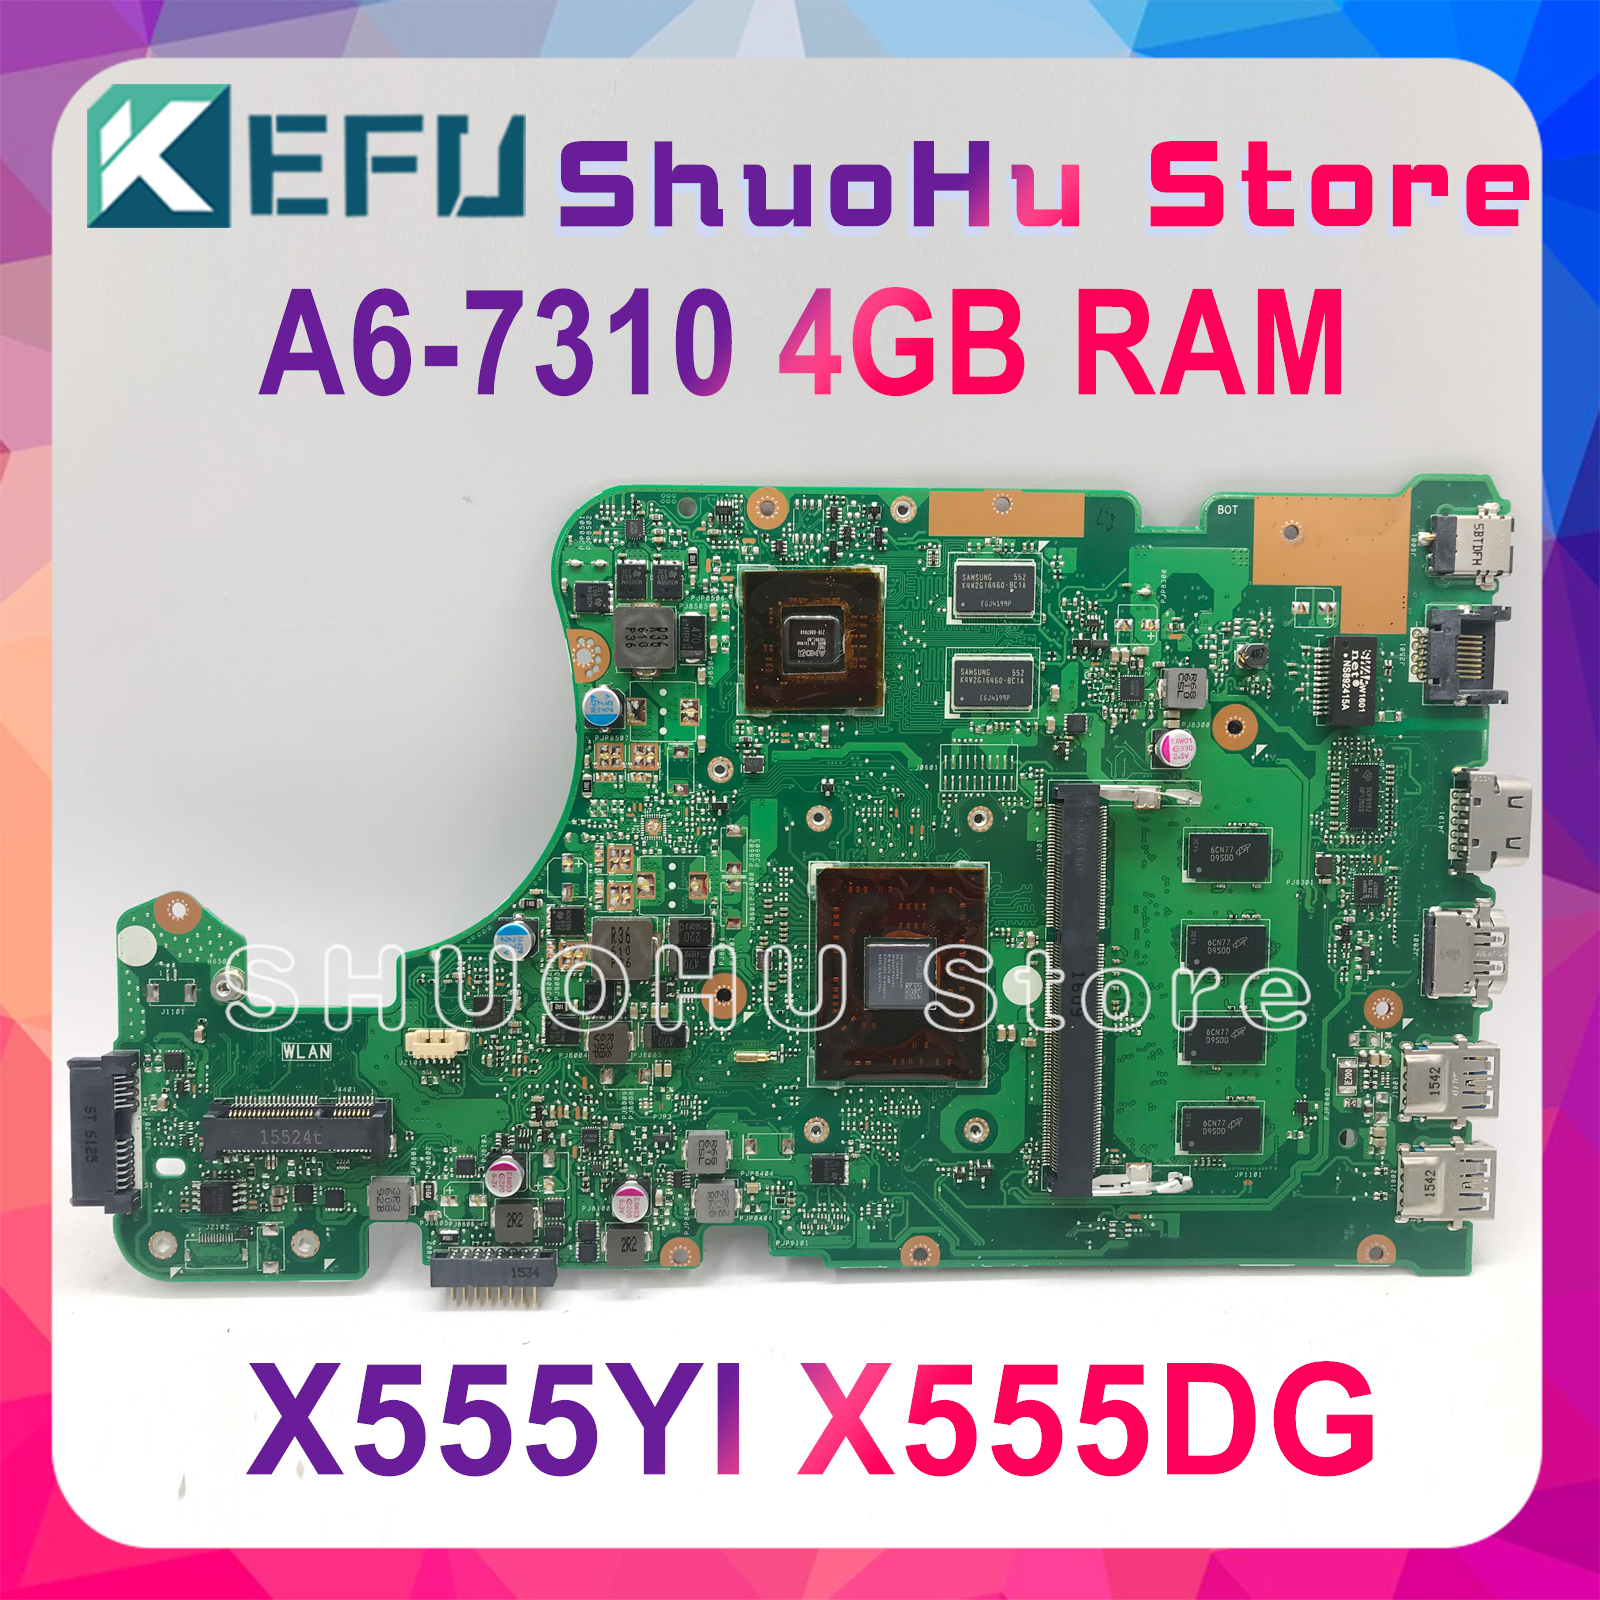 Bilgisayar ve Ofis'ten Anakartlar'de KEFU X555DG anakart FIT Için ASUS X555DG A555DG X555QG X555YI laptop anakart A6 7310 R5 M320 4GB Test çalışma 100% title=